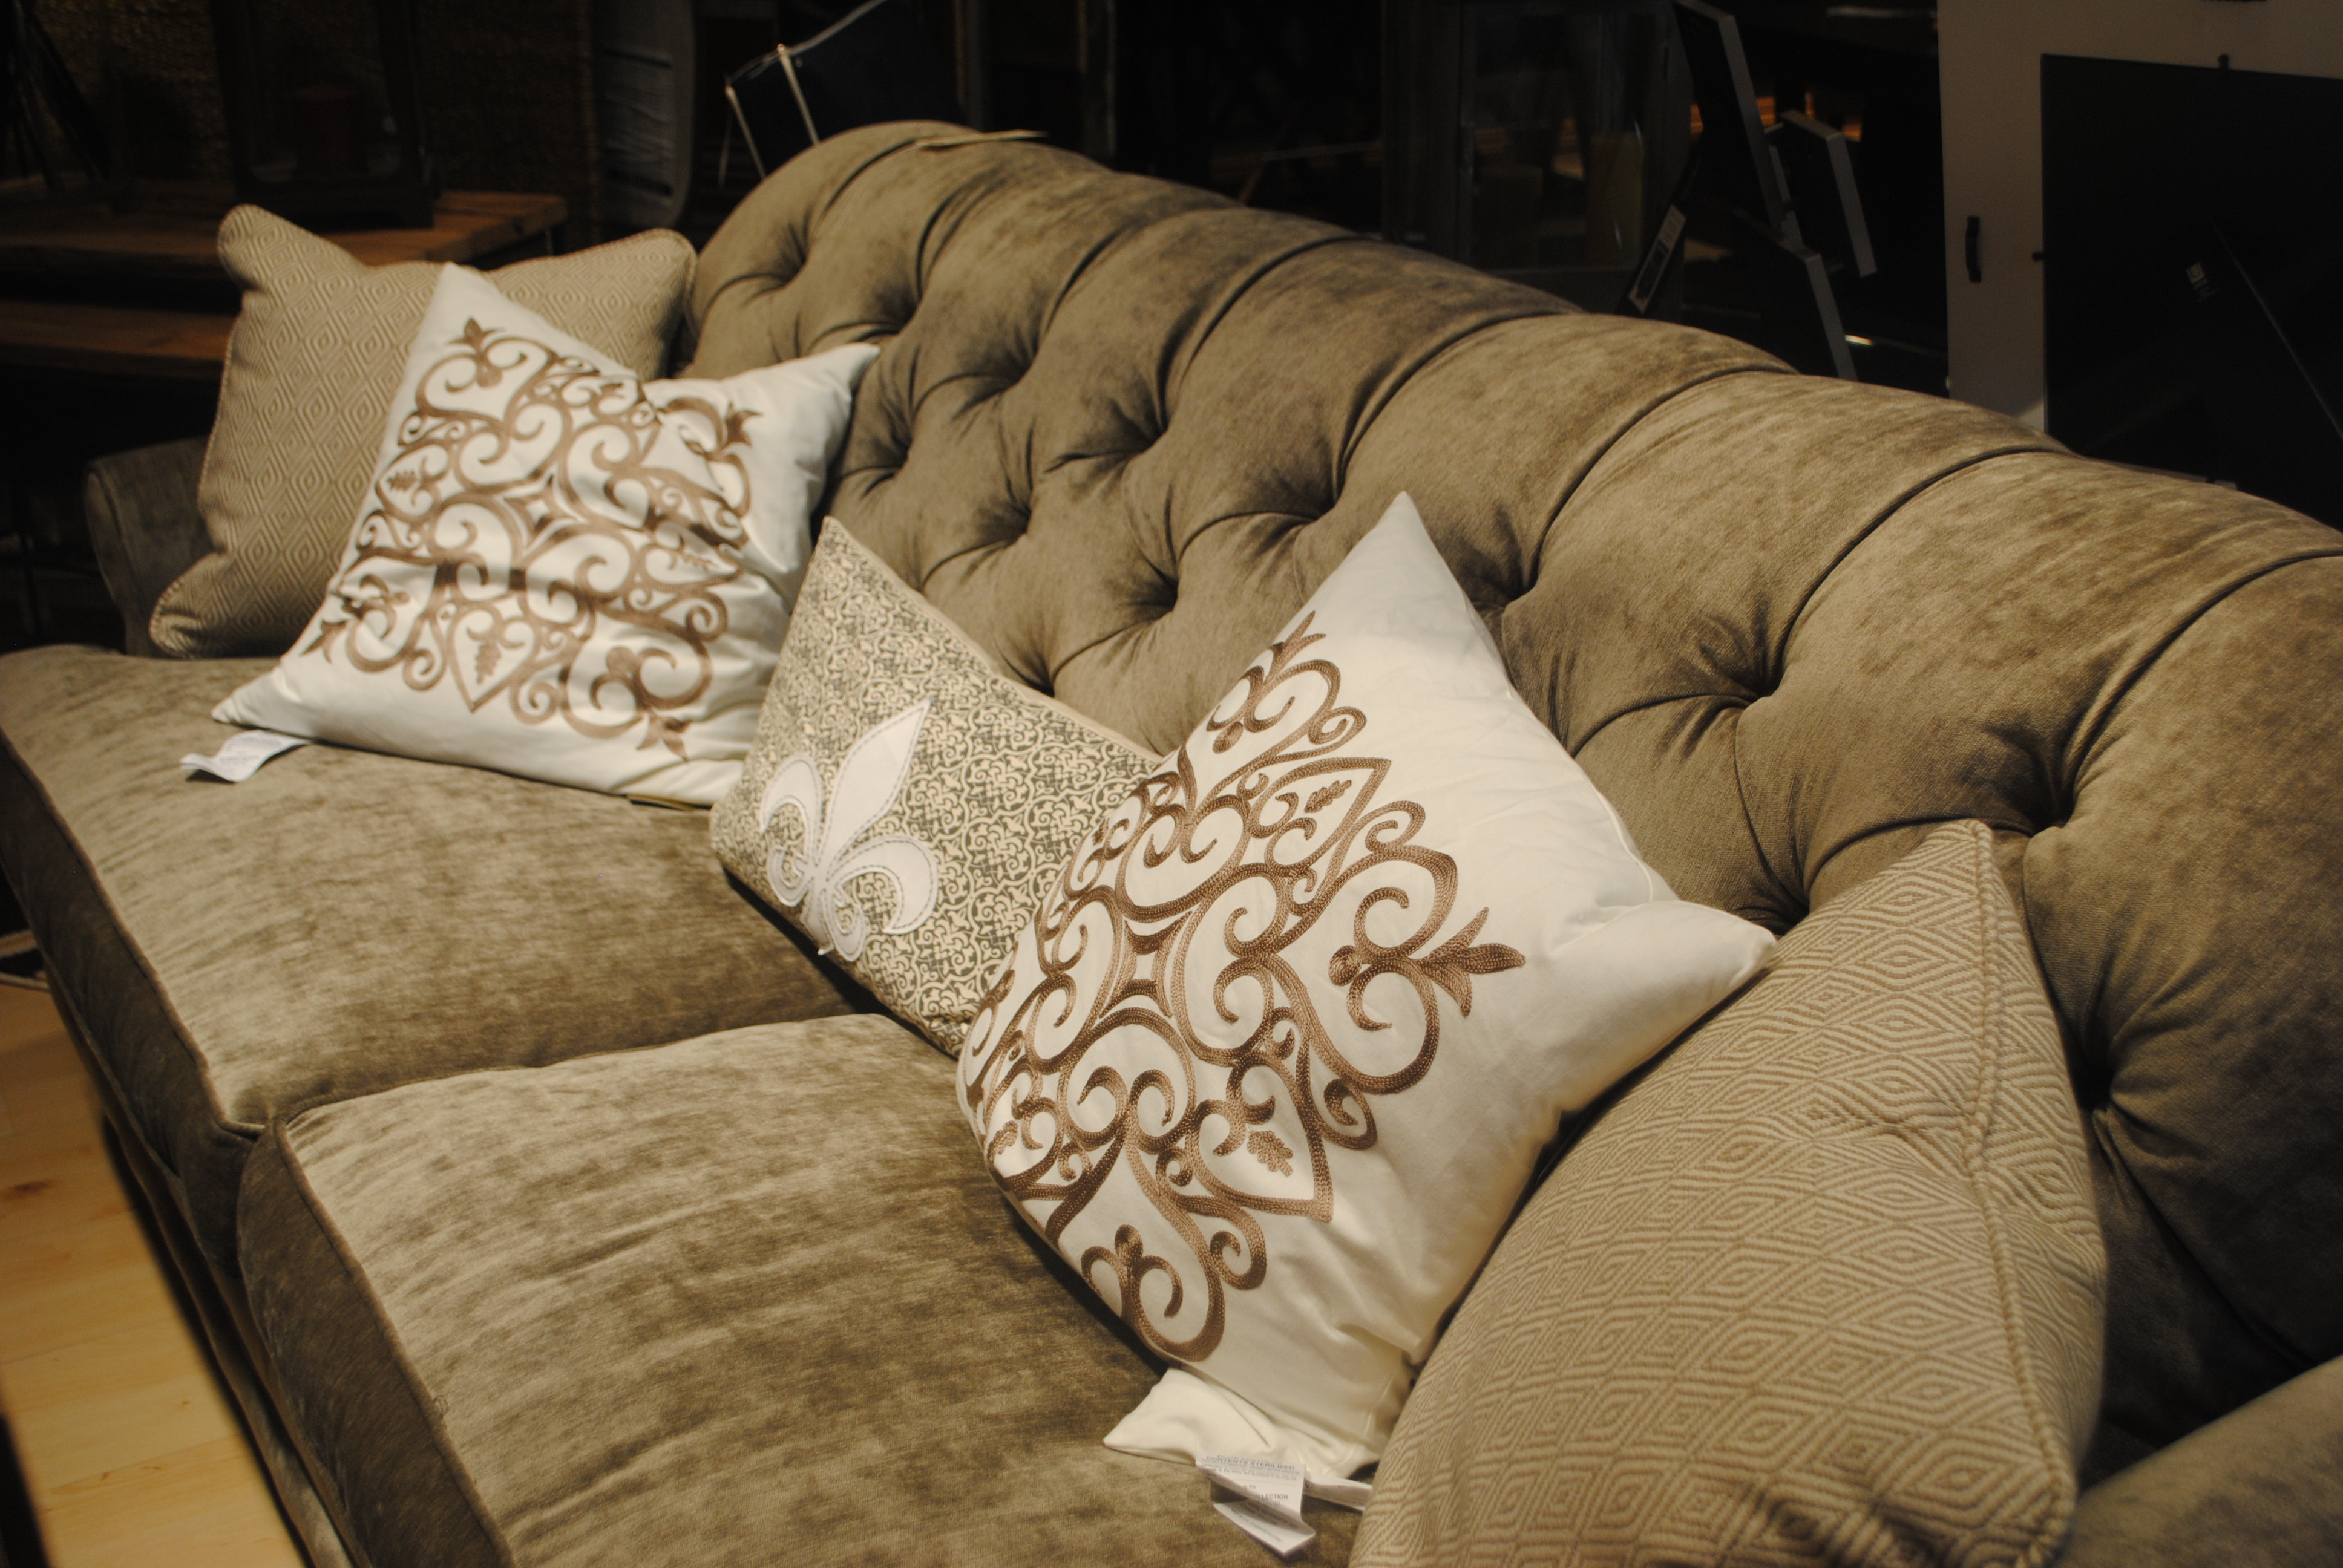 Sofa Su Casa Furniture Lovefeast Table